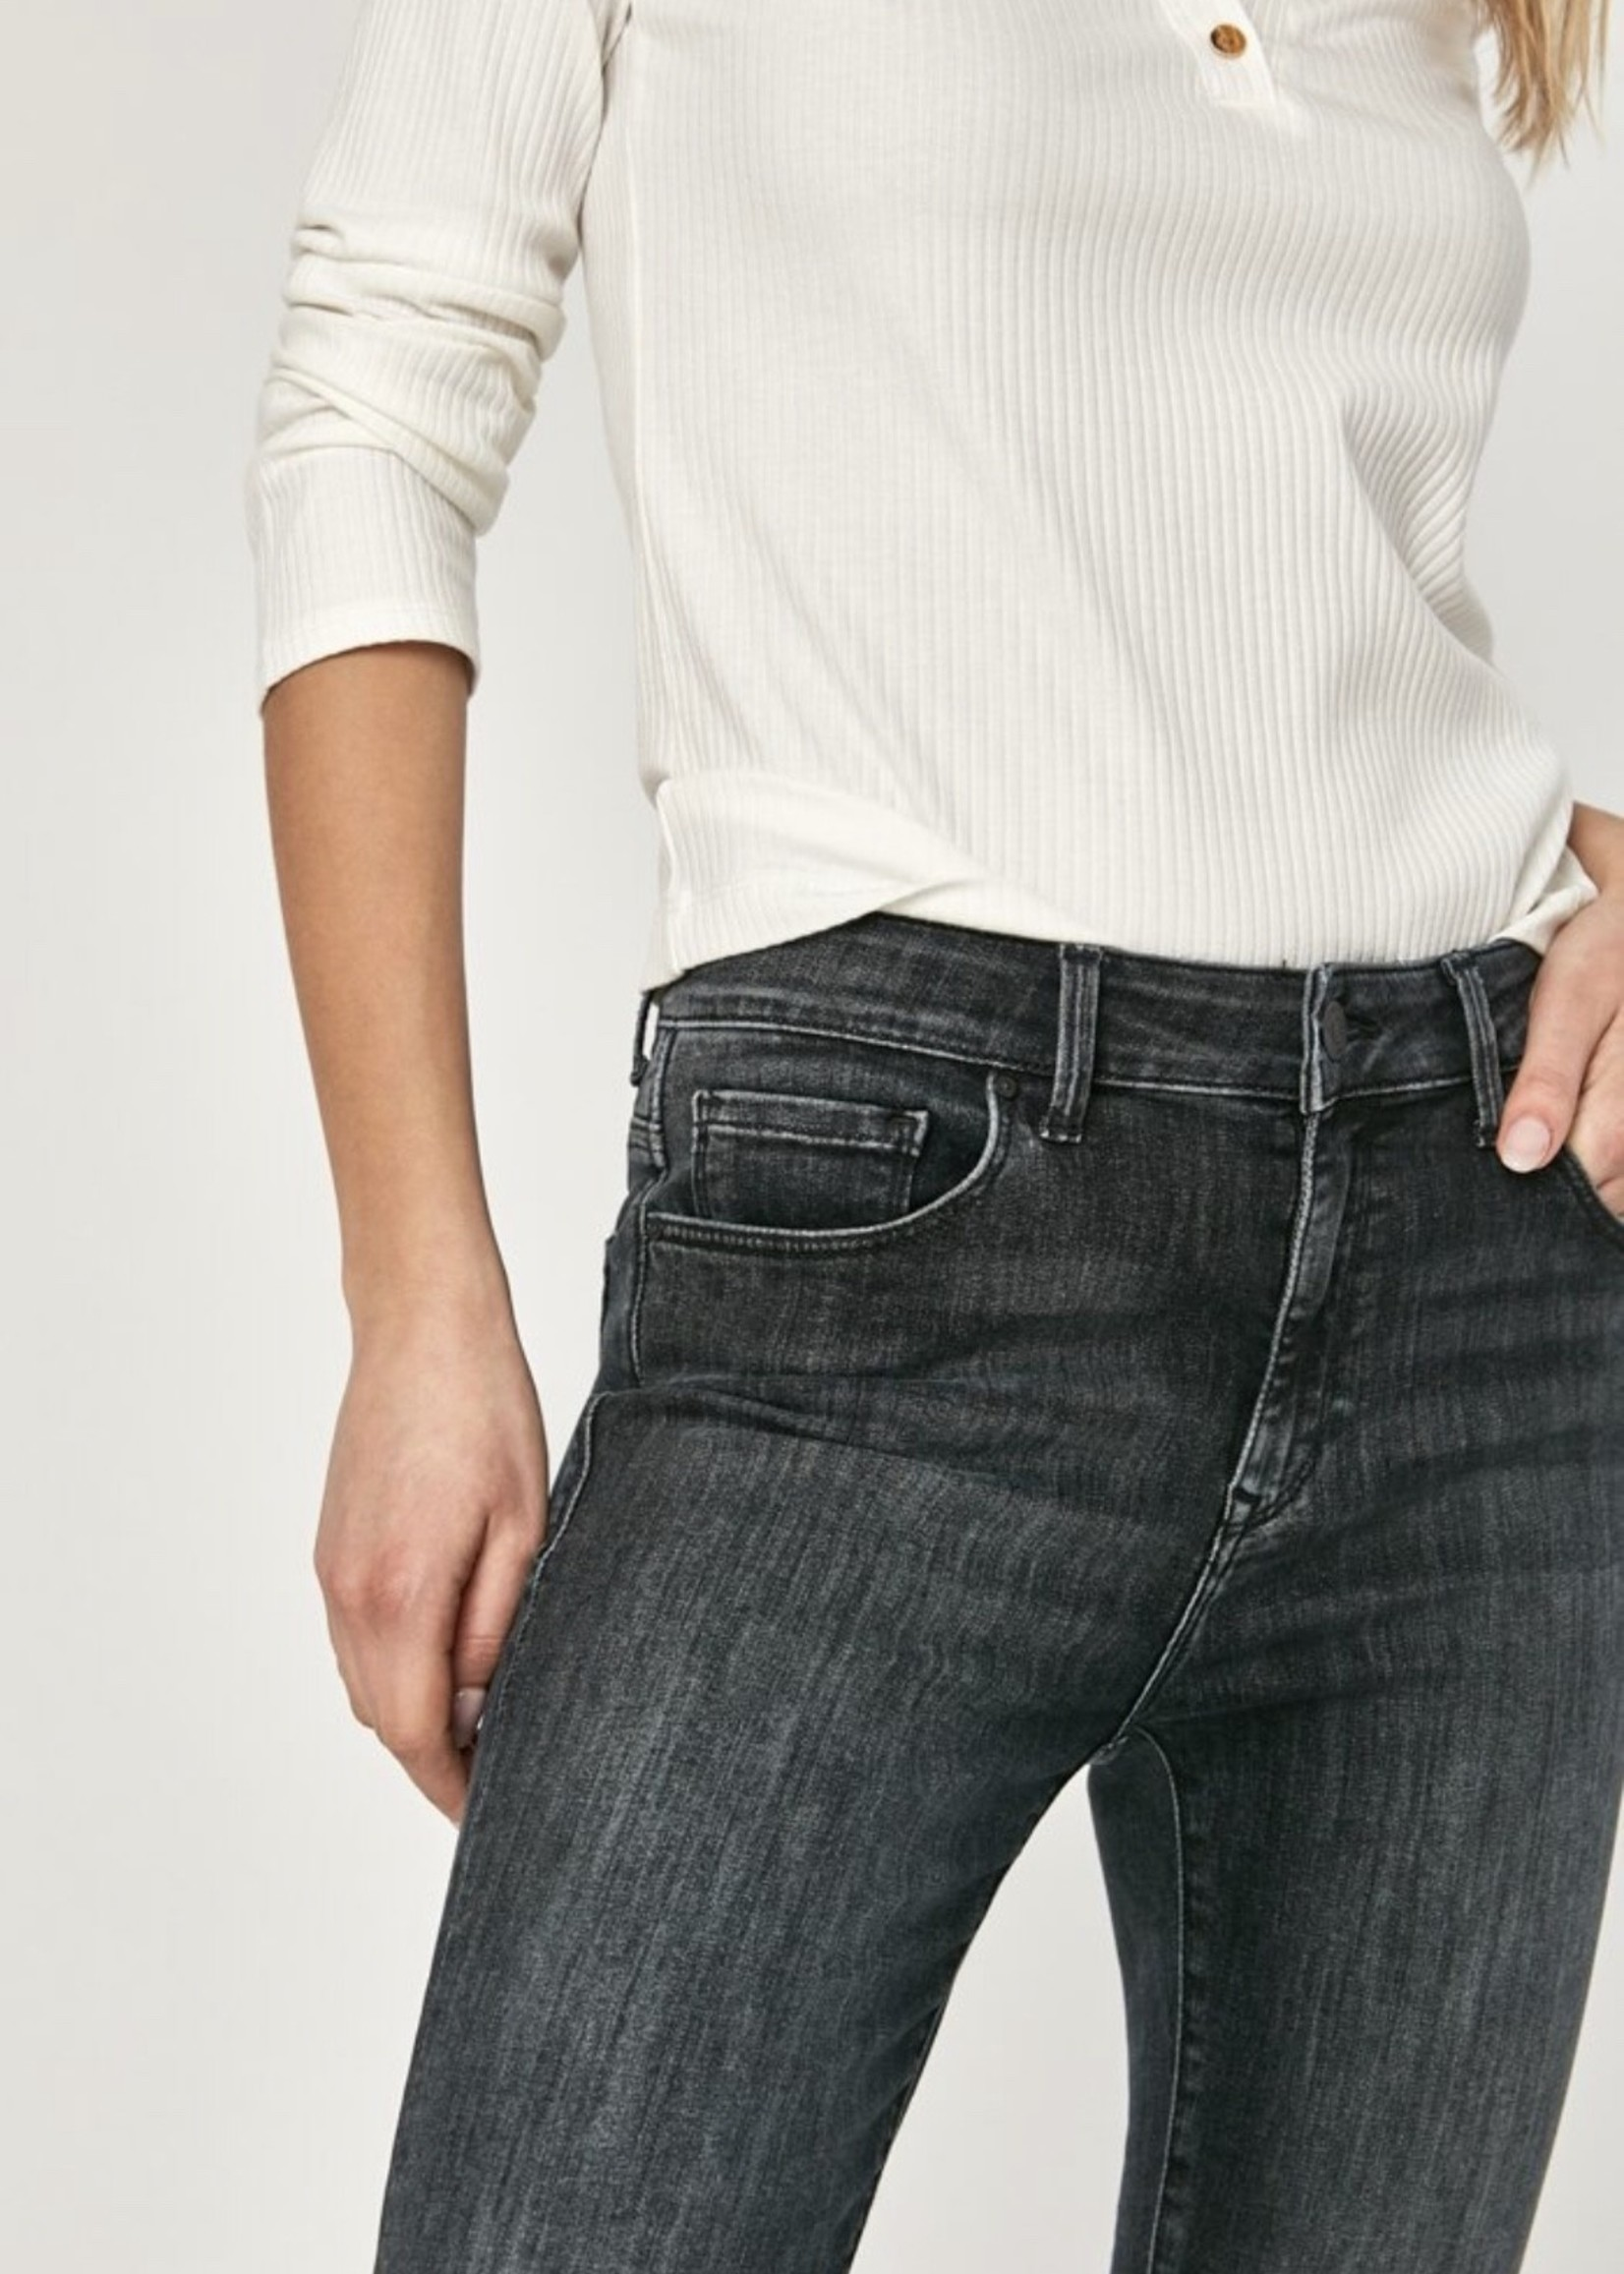 MAVI Jeans Tess Crop Denim